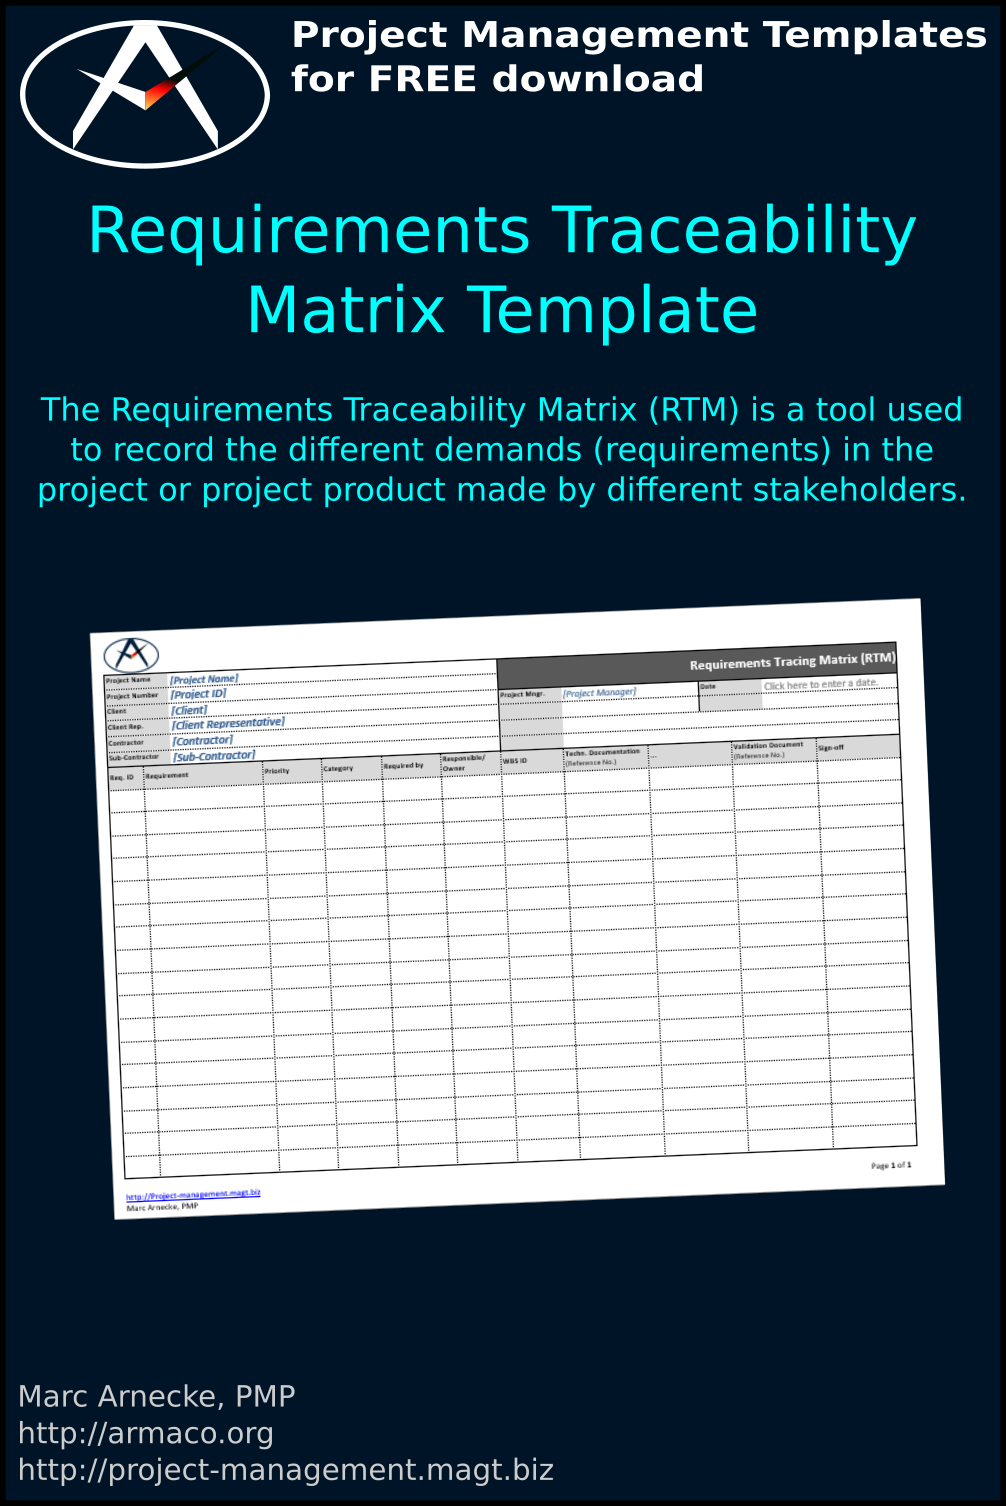 download Requirements Traceability Matrix Template